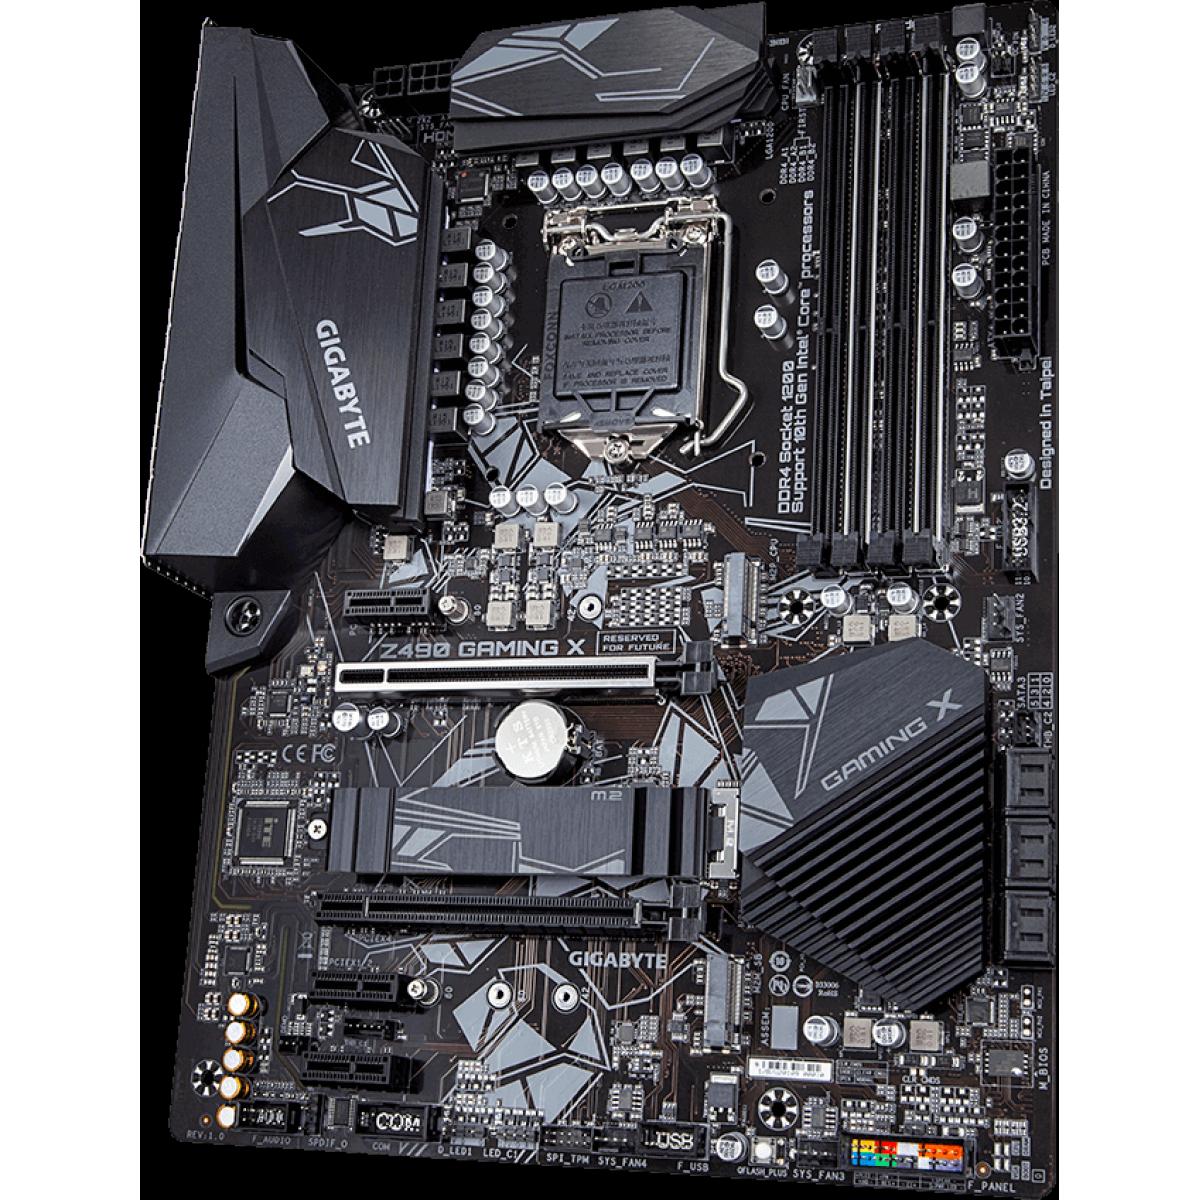 Placa Mãe Gigabyte Z490 Gaming X 1.0, Chipset Z490, Intel LGA 1200, ATX, DDR4